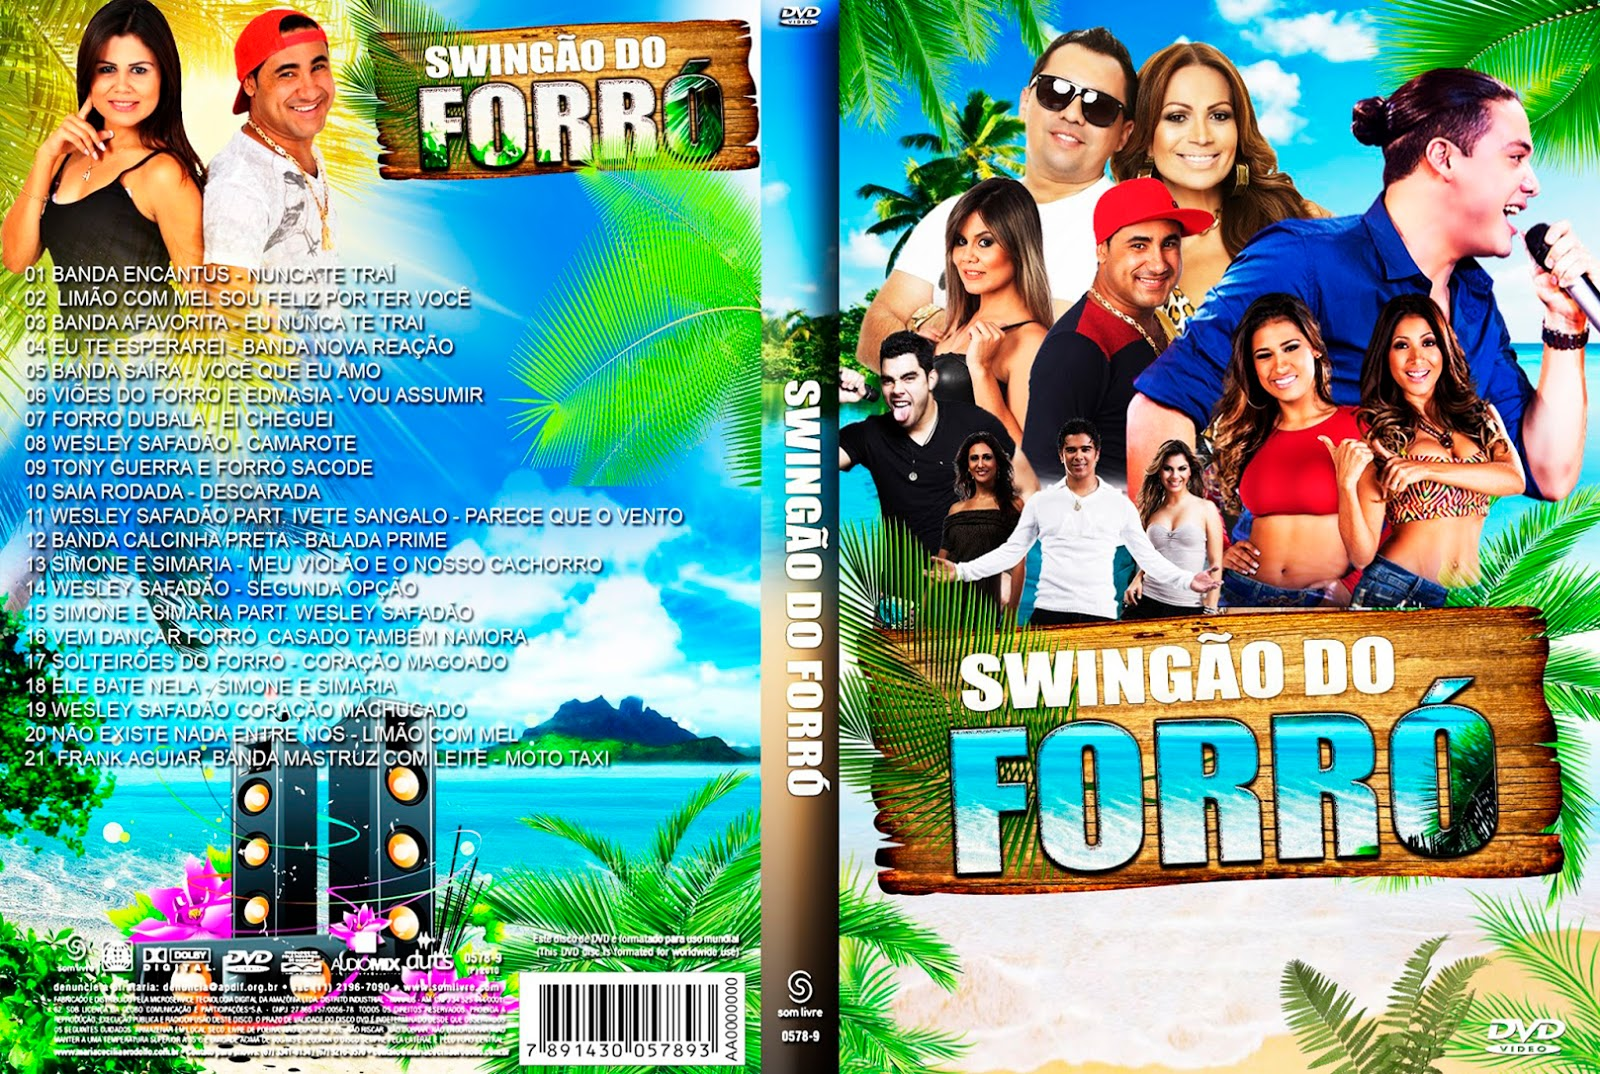 Swingão Do Forró DVD-R Swing 25C3 25A3o 2BDo 2BForr 25C3 25B3 2B2016 2B  2BXANDAODOWNLOAD